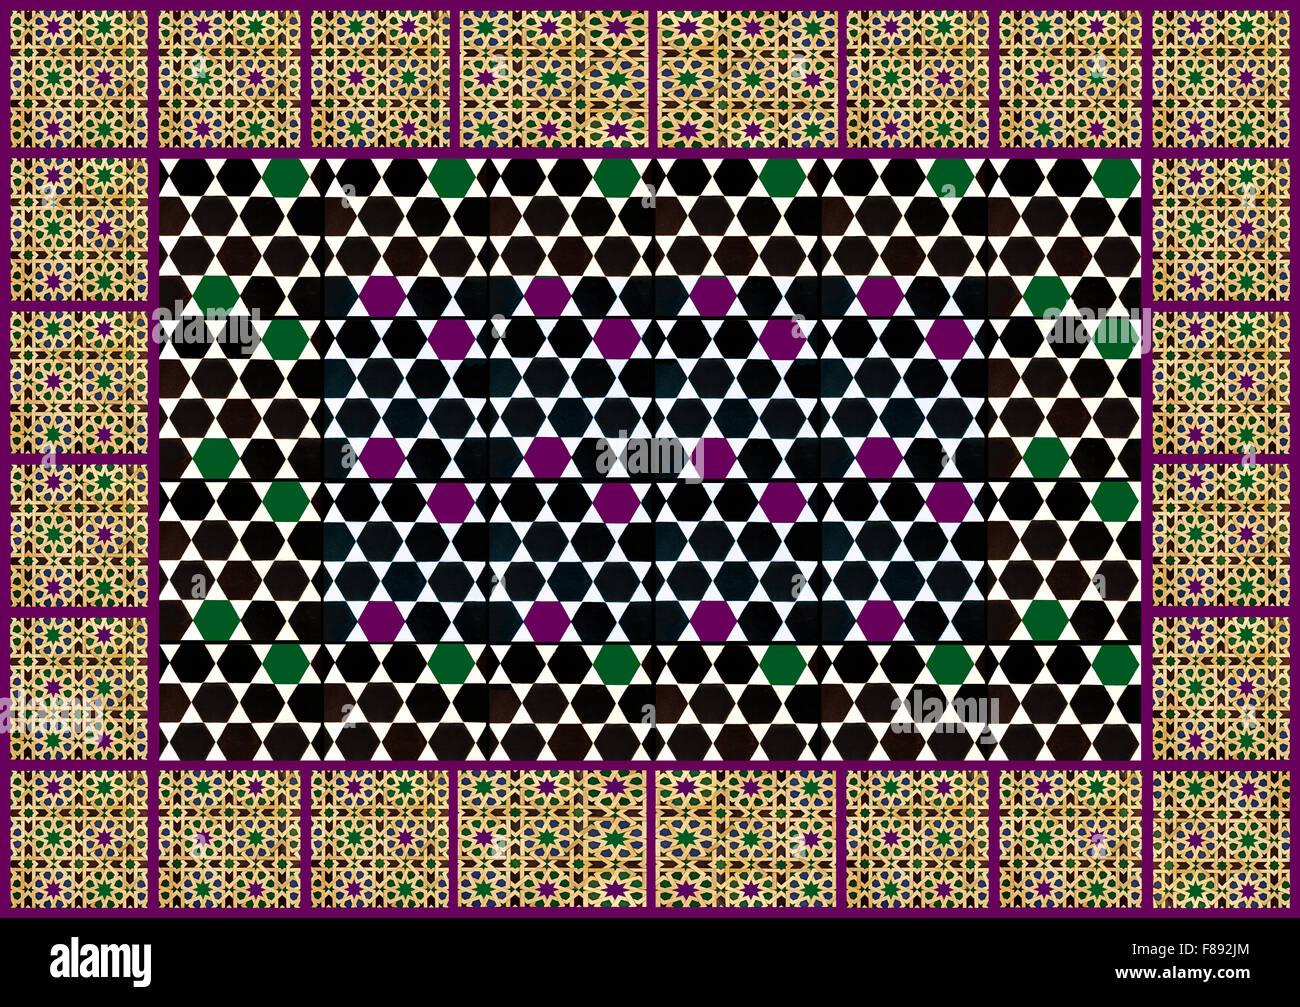 Moroccan geometric pattern royalty free stock photos image 13547078 - Moorish Geometric Patterns Pattern Stock Photo Royalty Free Image 1300x1008